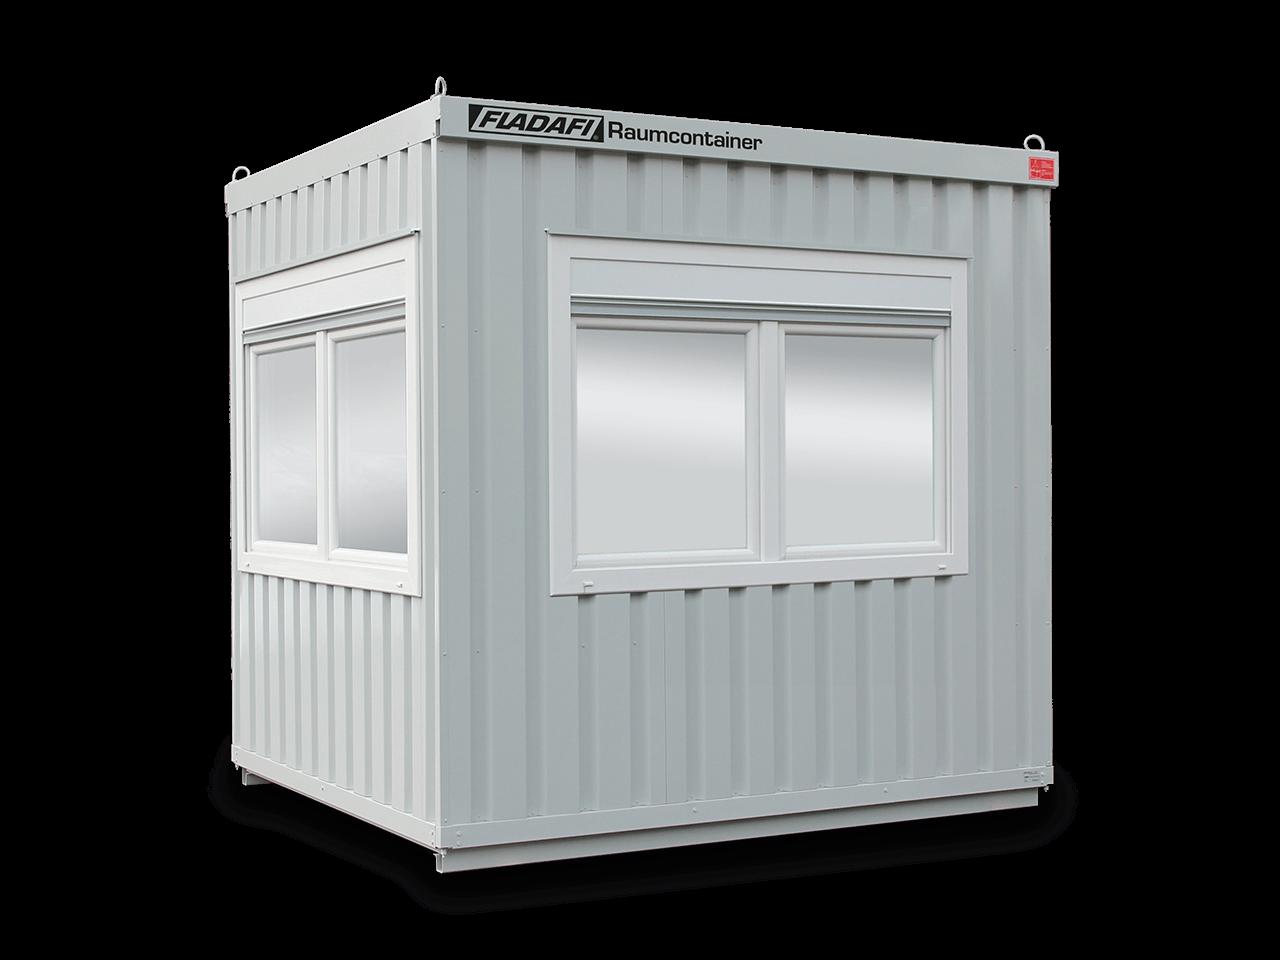 6834_FLADAFI-Raumcontainer-3M-6834_RC3M6834_RGB_0011_ft_sn_sl.png